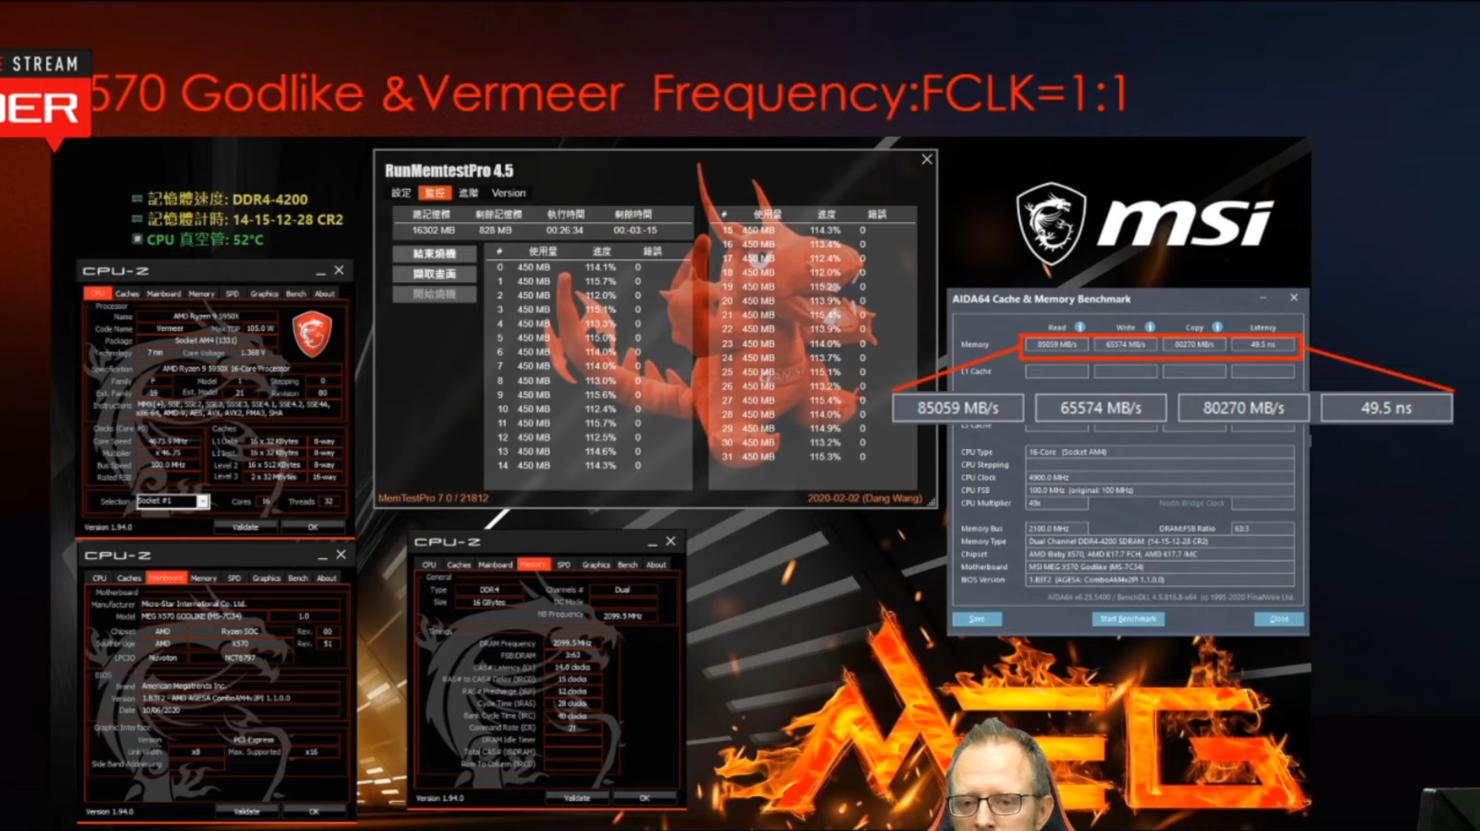 amd-ryzen-5000-zen-3-desktop-cpus_msi-overclock-memory-fclk_4